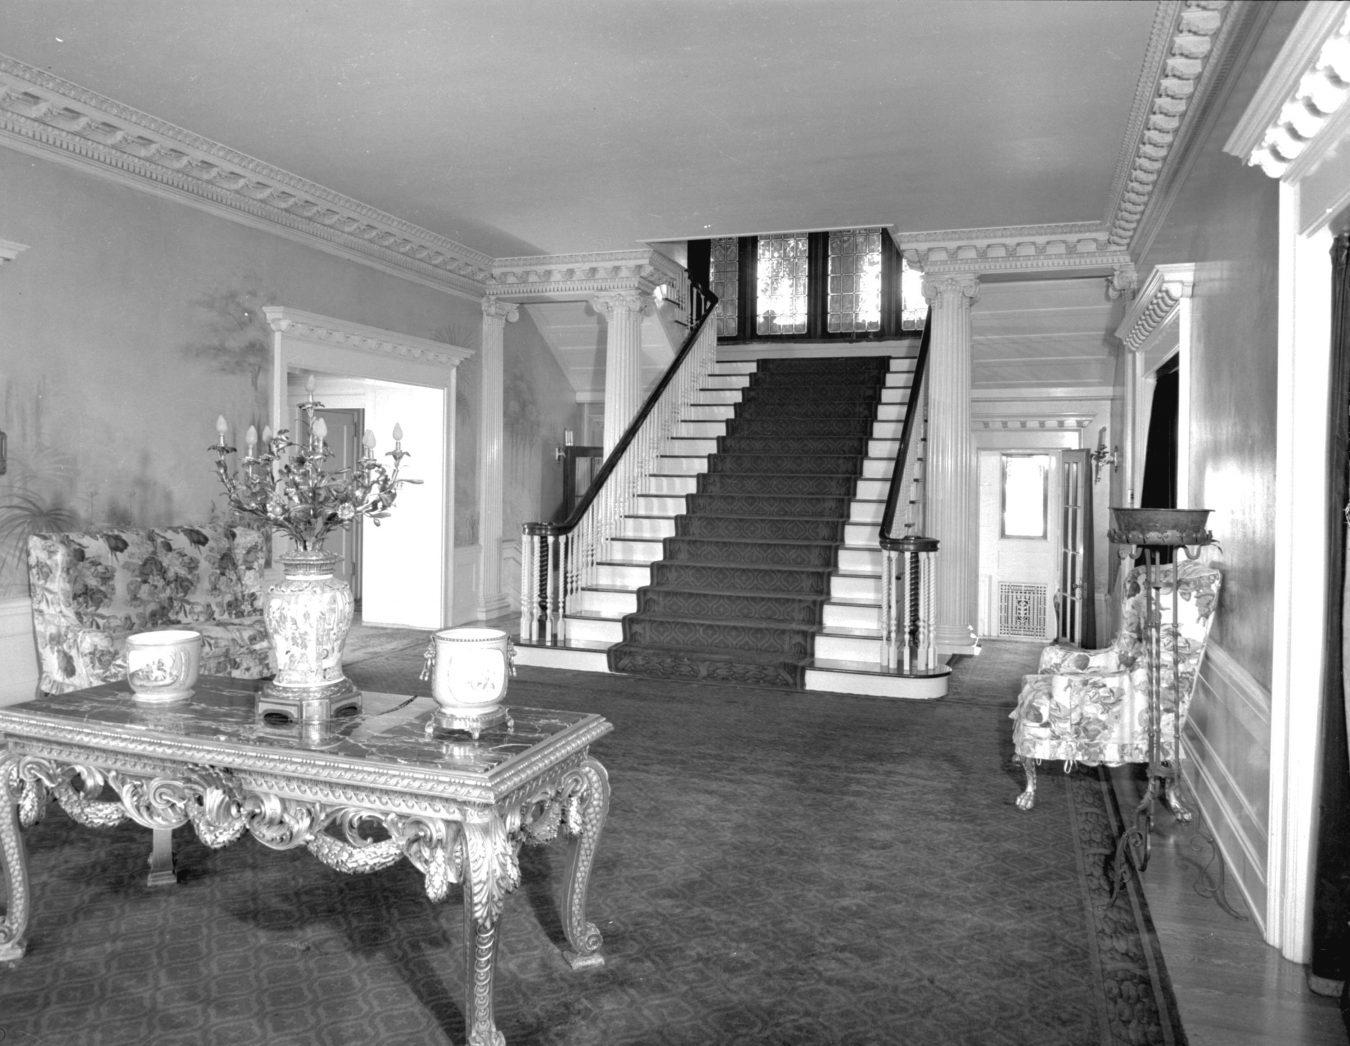 Hycroft Manor interior